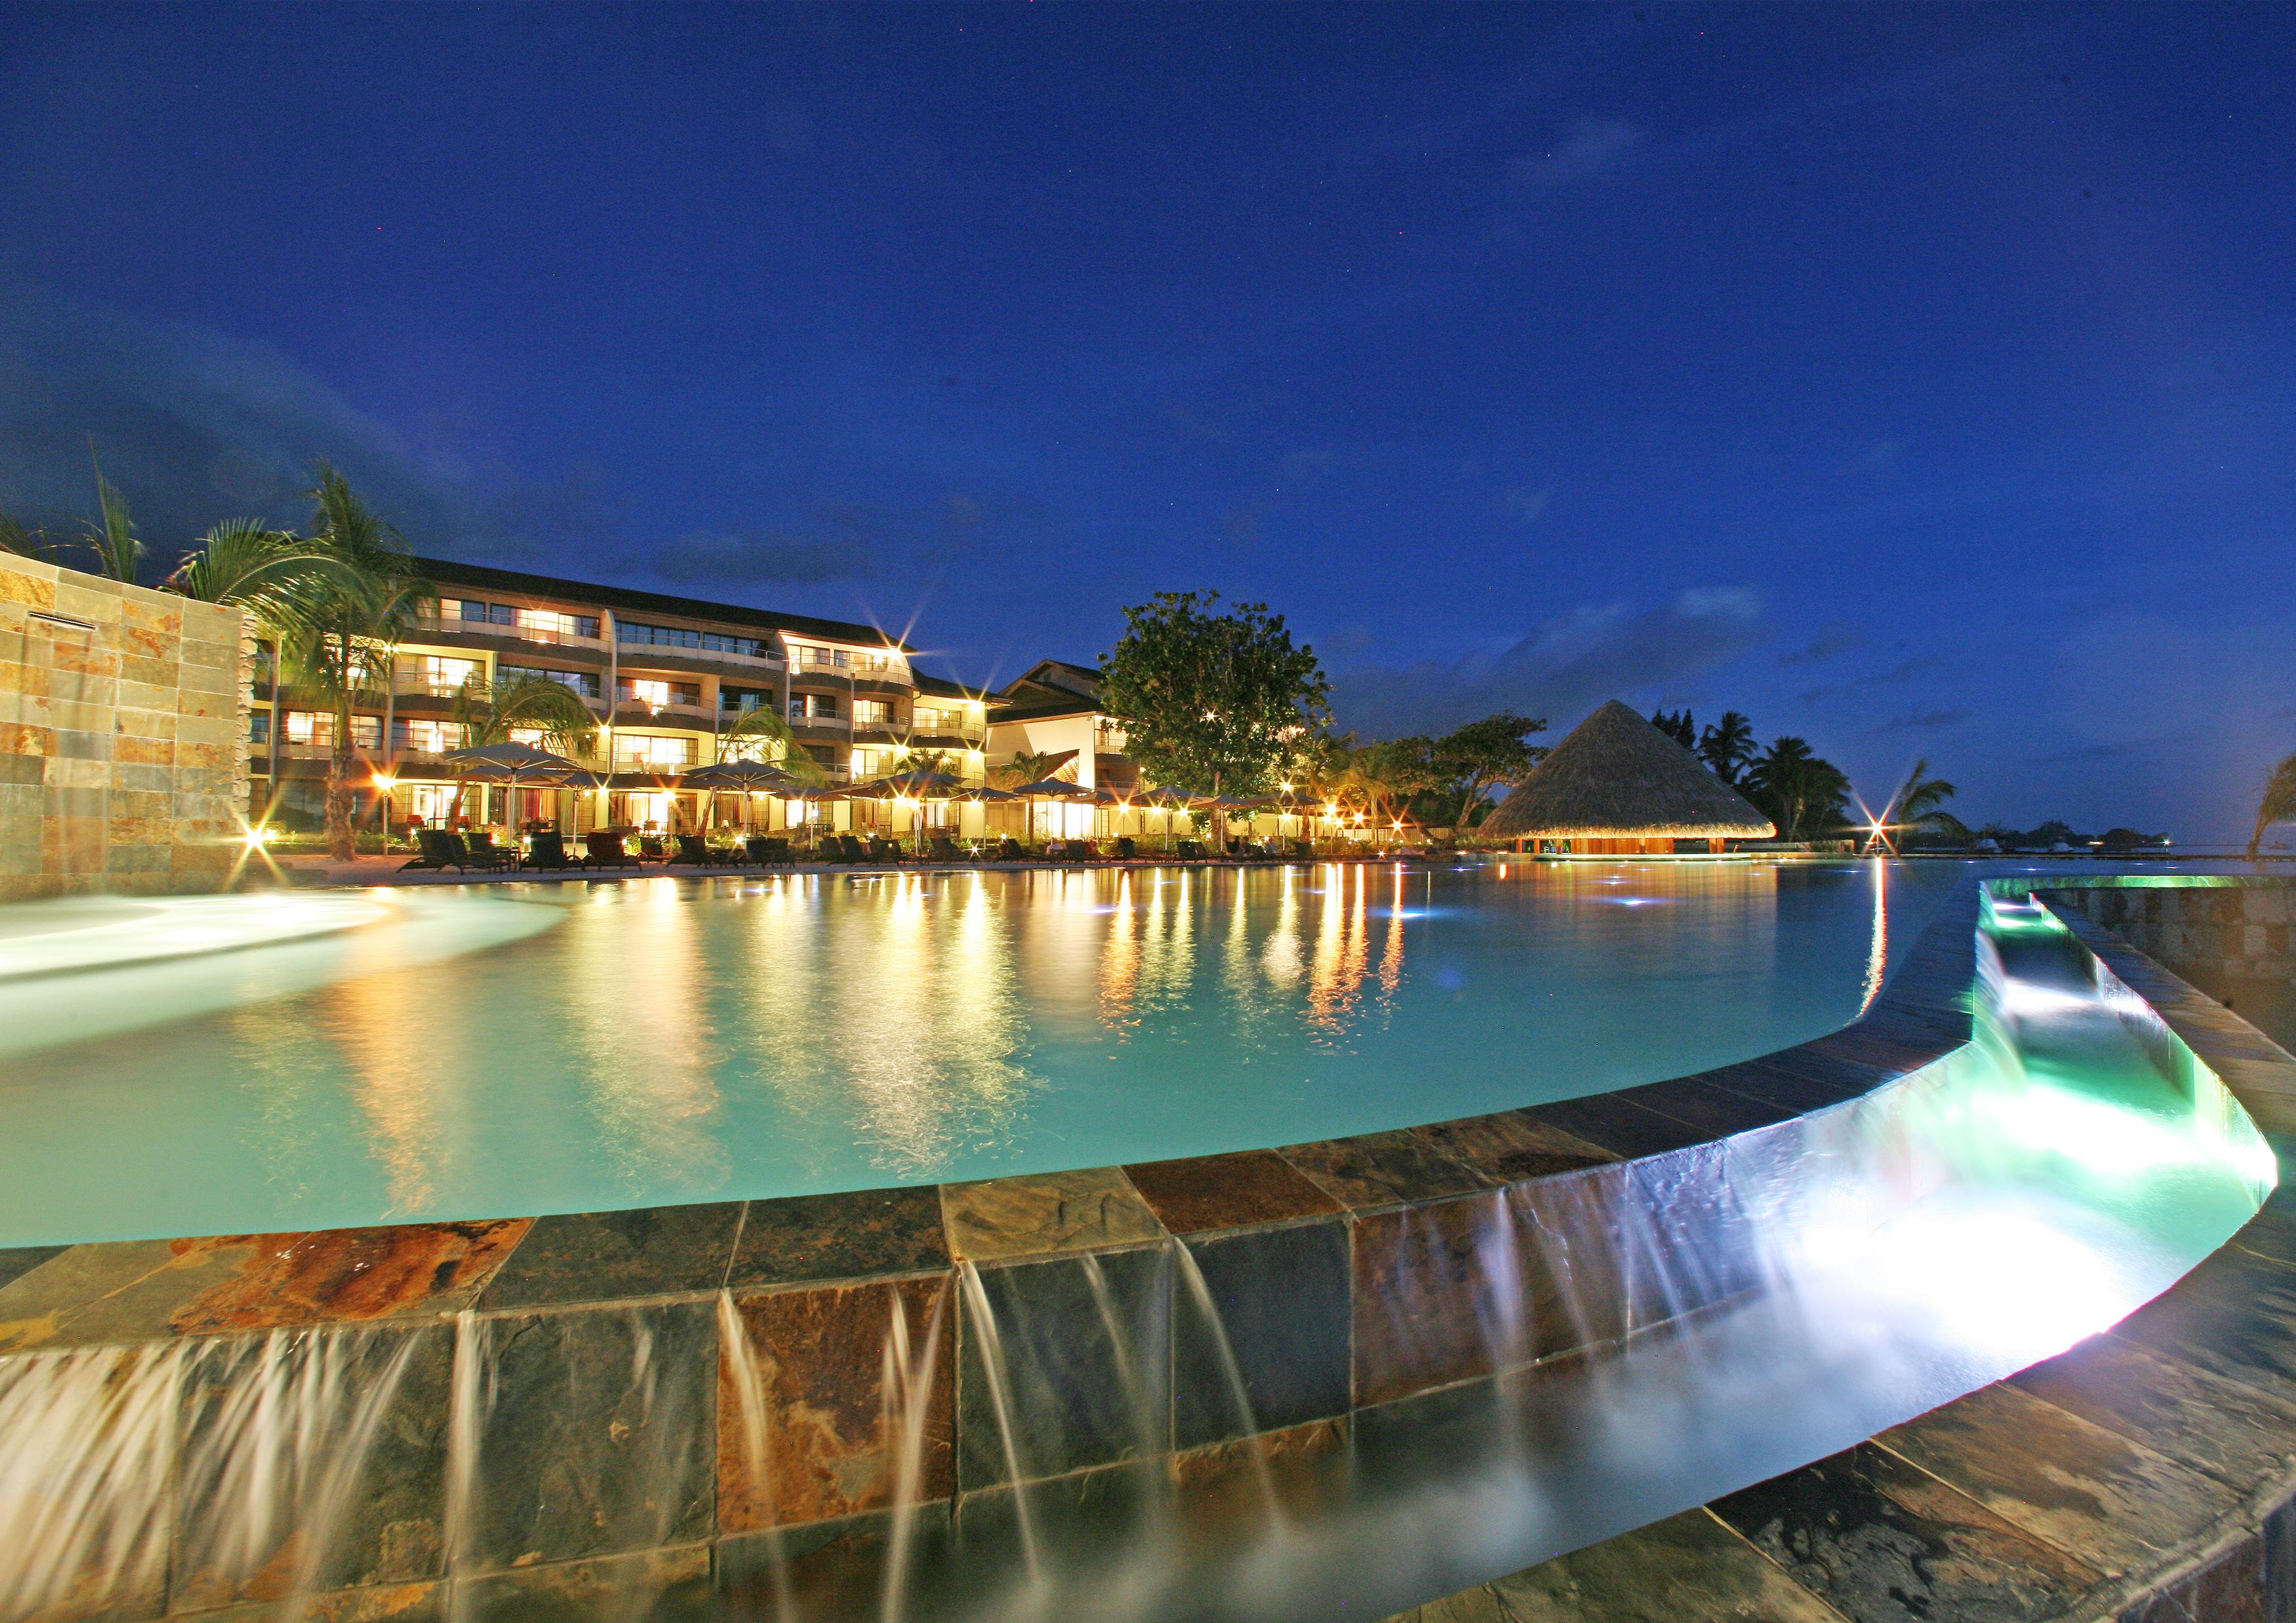 https://tahititourisme.com/wp-content/uploads/2017/08/HEBERGEMENT-Manava-Suite-Resort-Tahiti-1-®-GLB.jpg